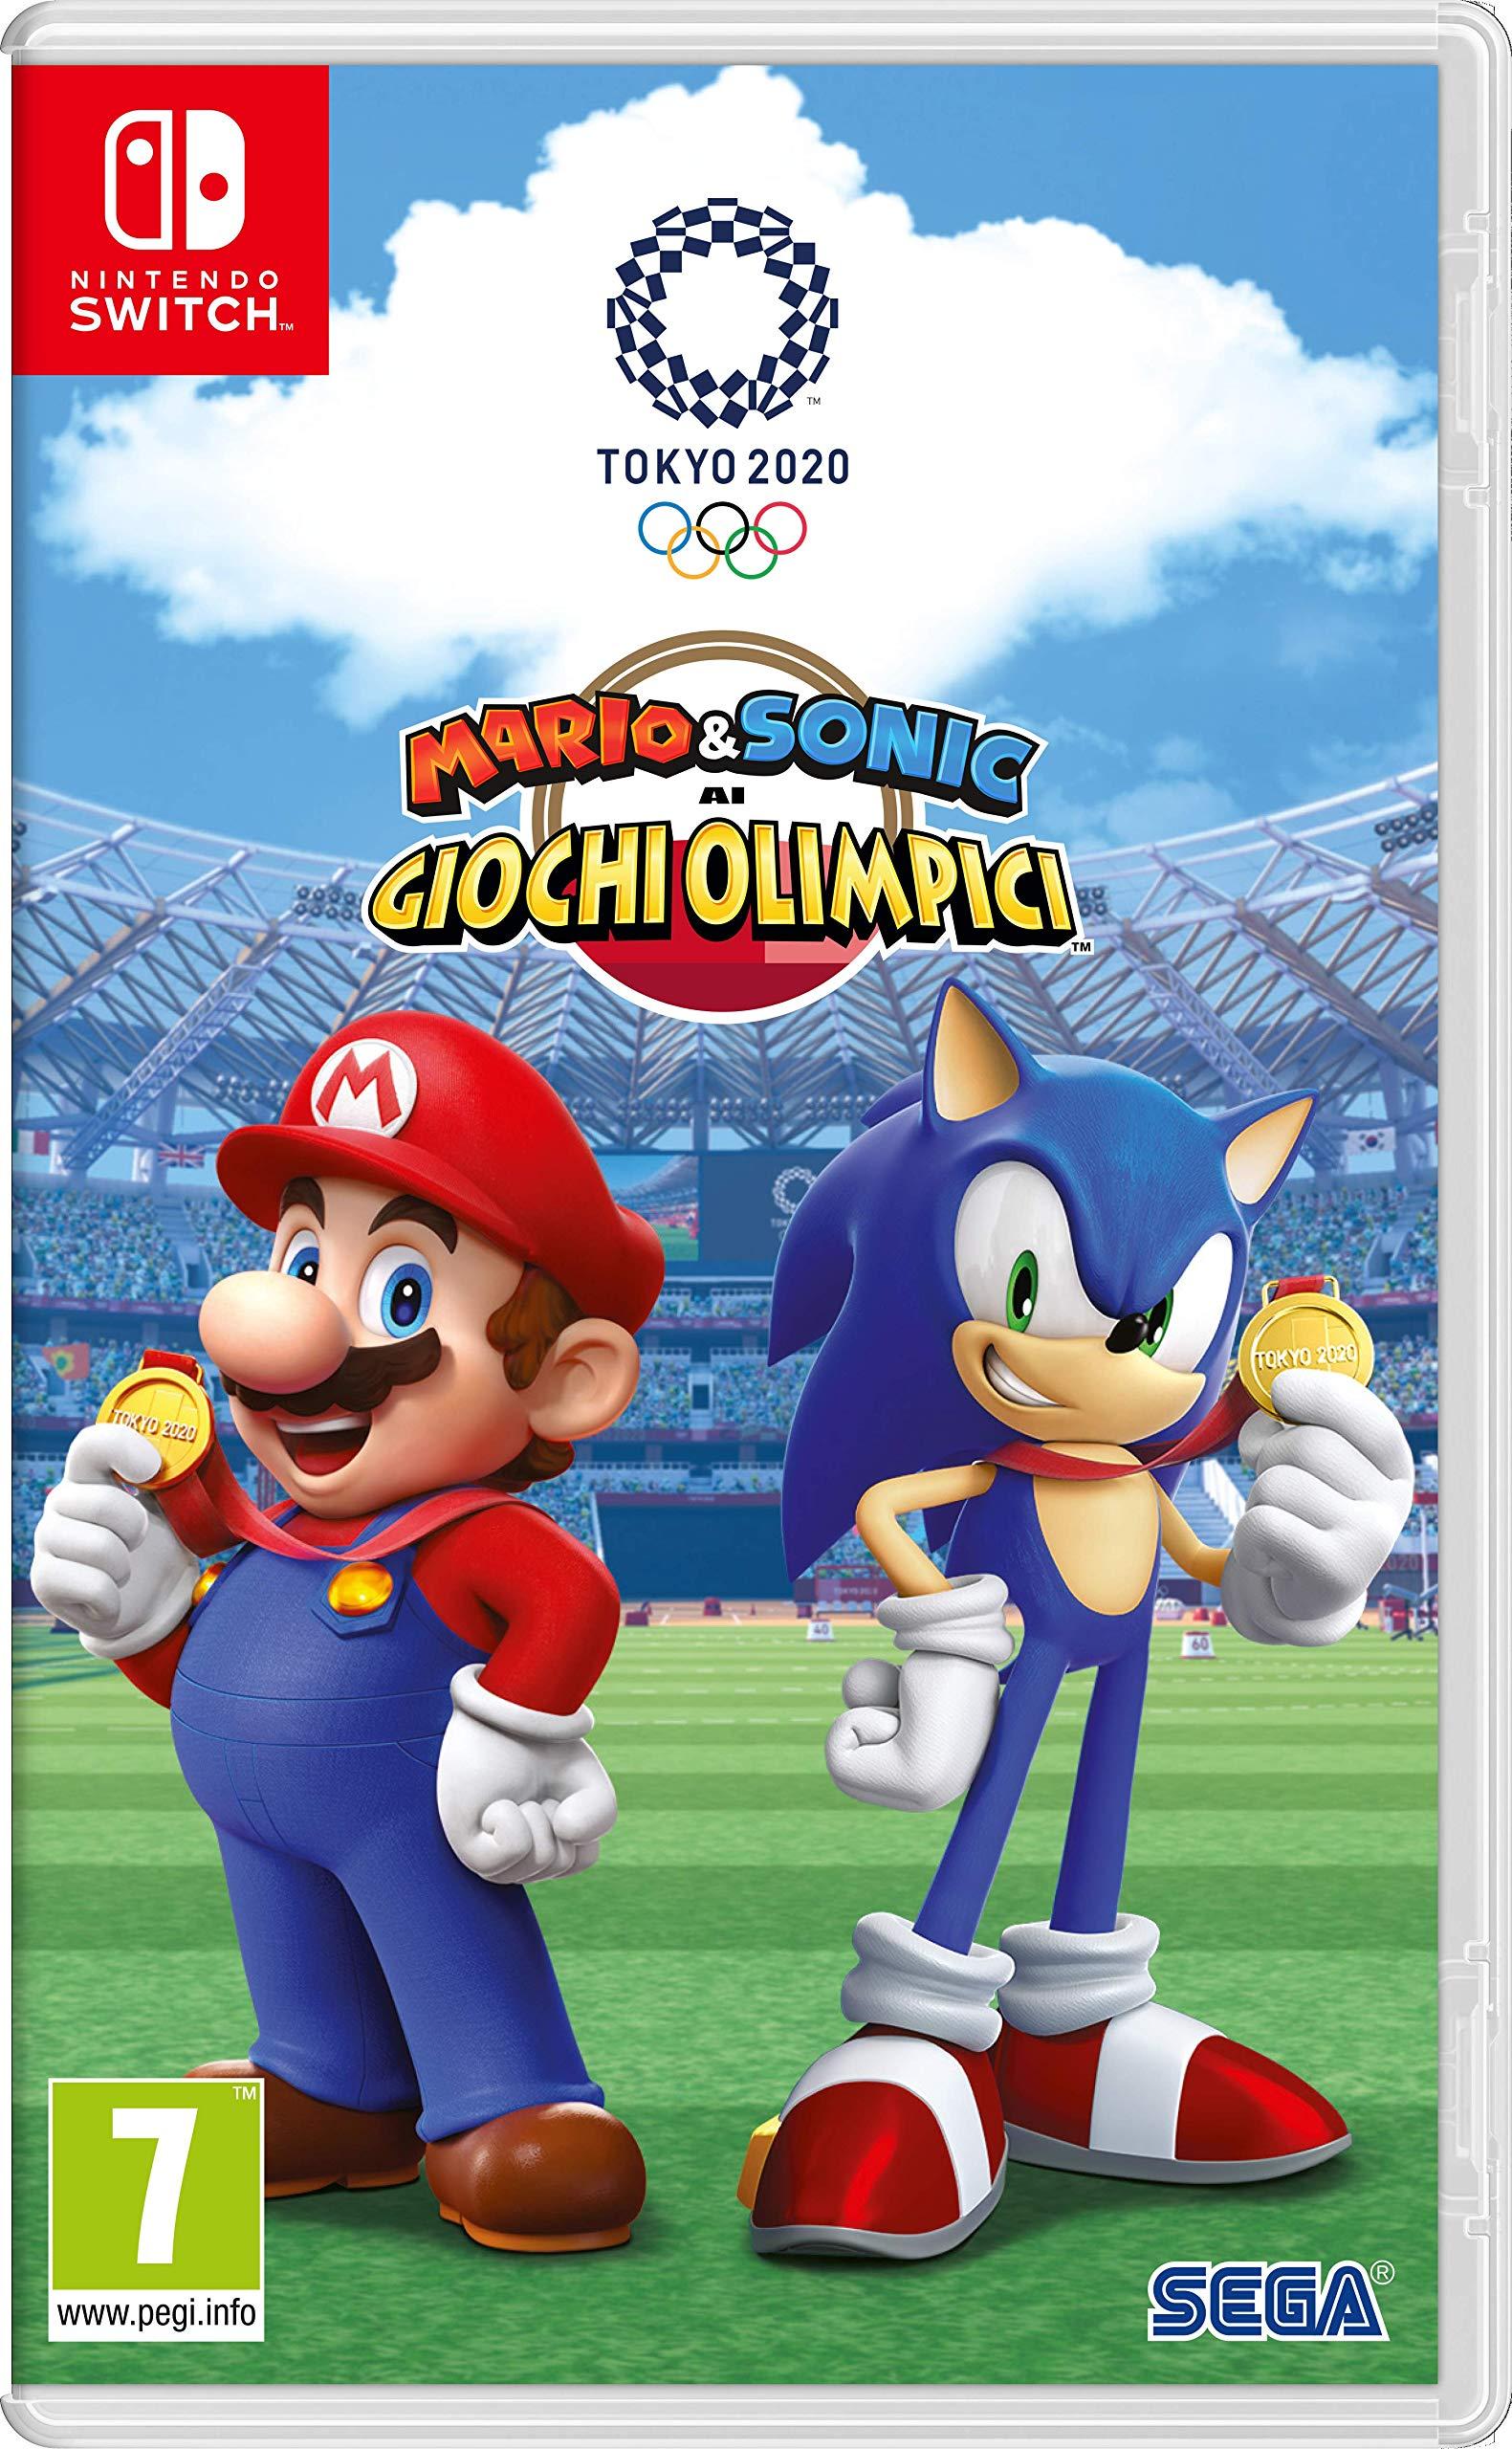 Mario & Sonic Giochi Olimpici: Amazon.es: Videojuegos